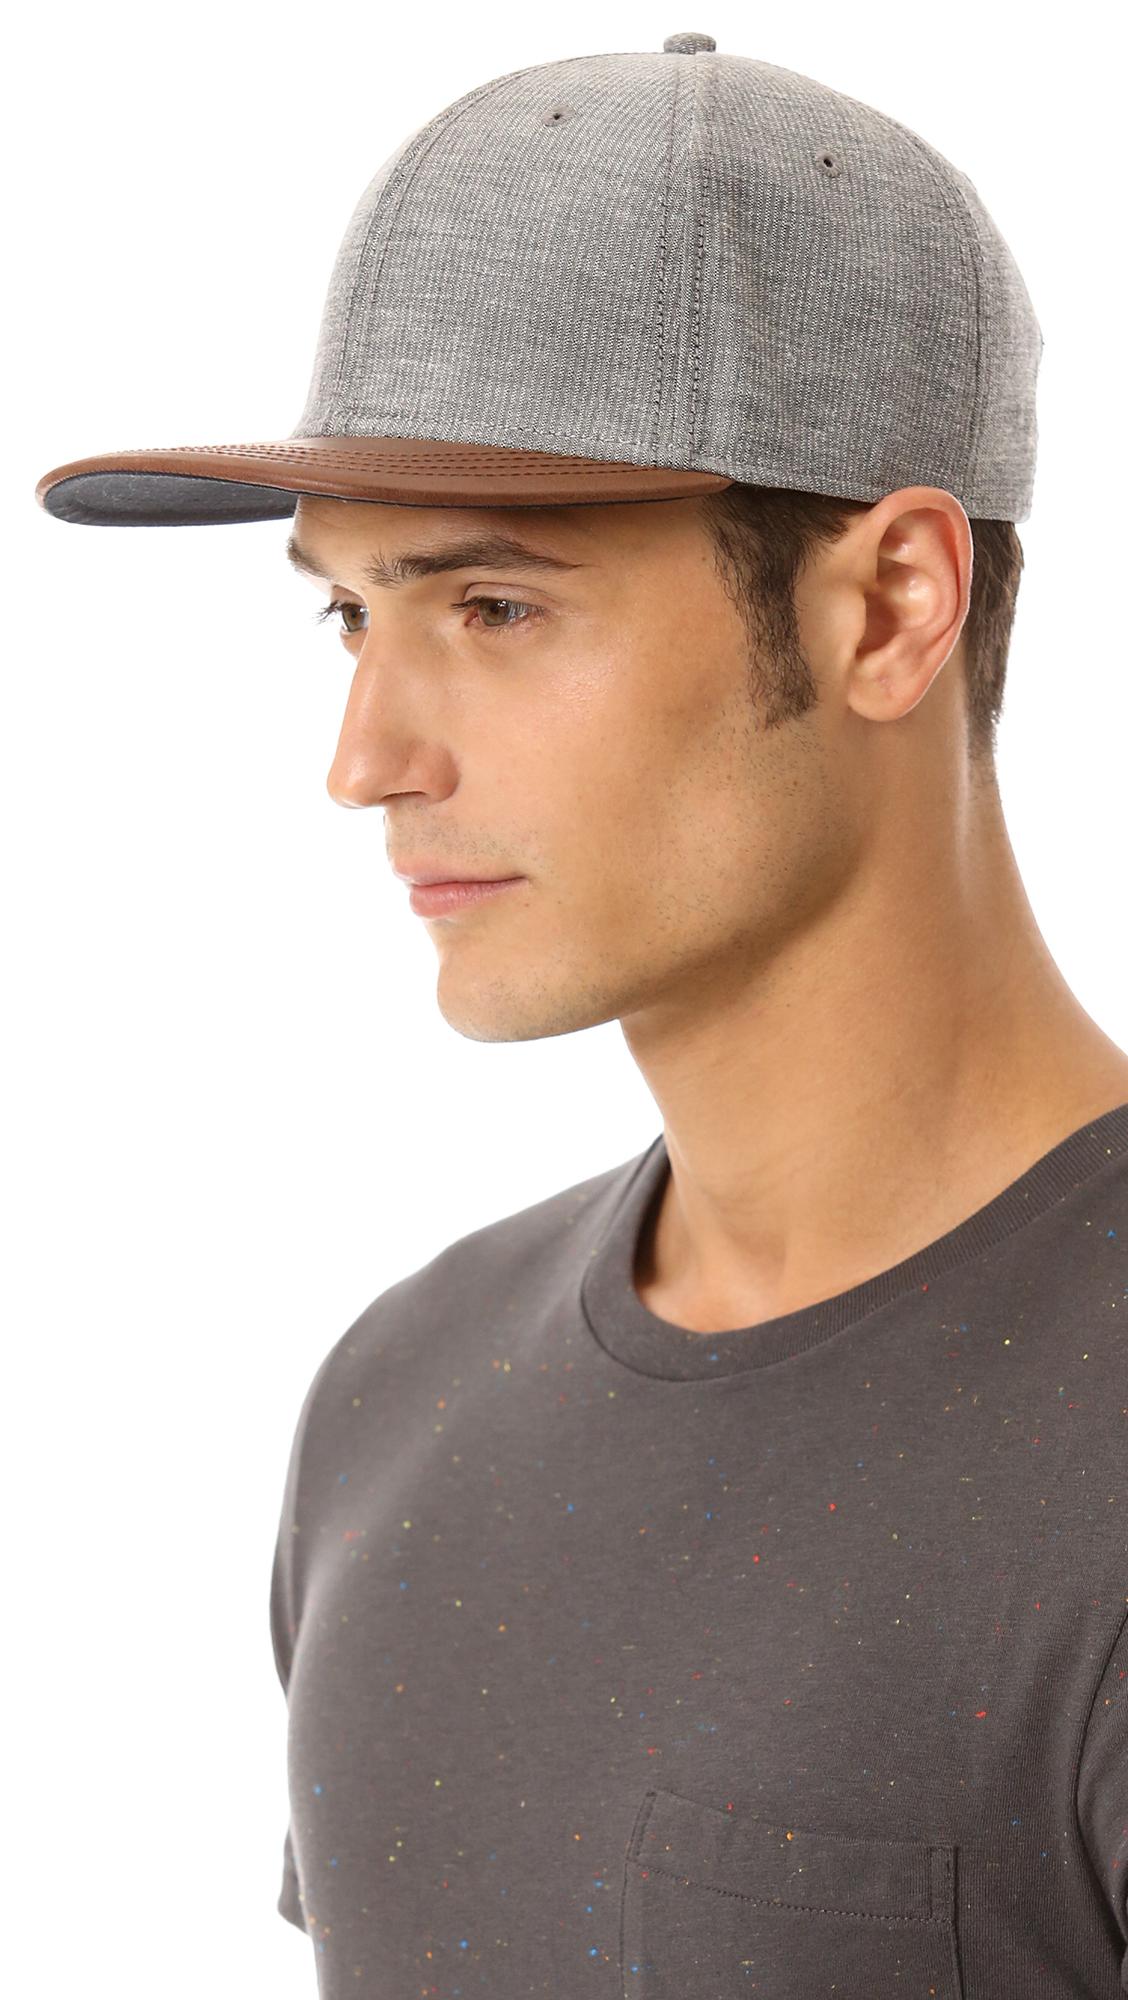 b6ec01aaf2652 Lyst - Rag   Bone Baseball Cap with Leather Brim in Gray for Men